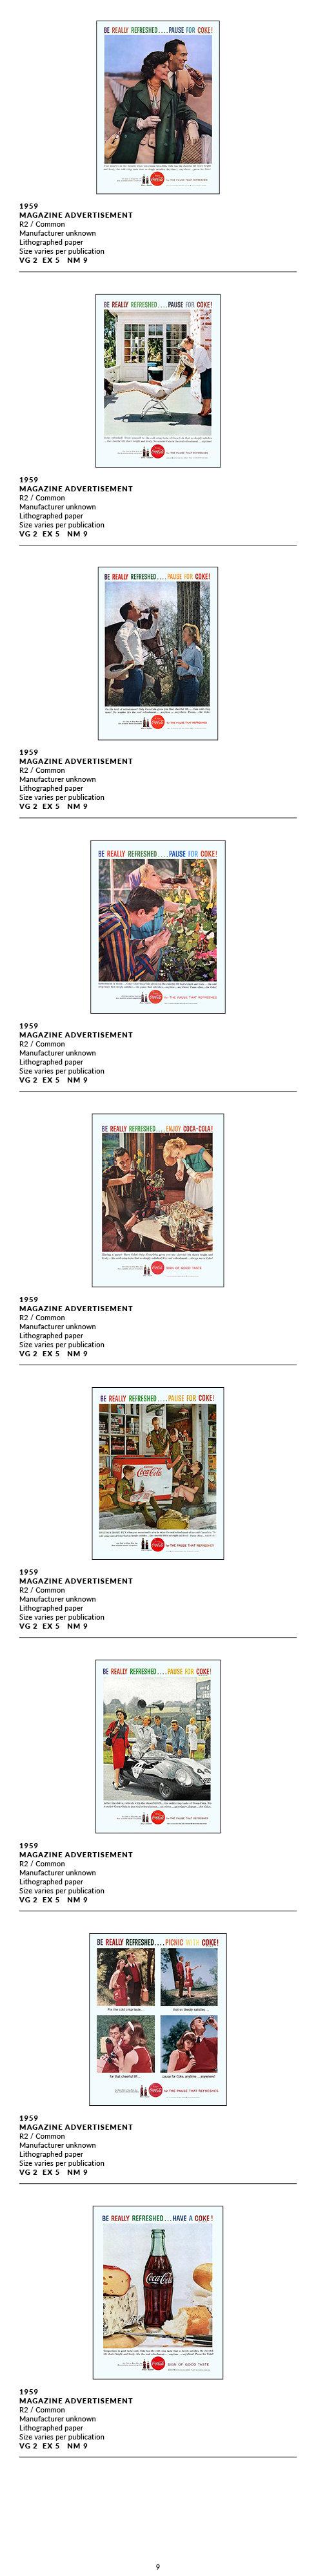 1955-59 Ads_9.jpg